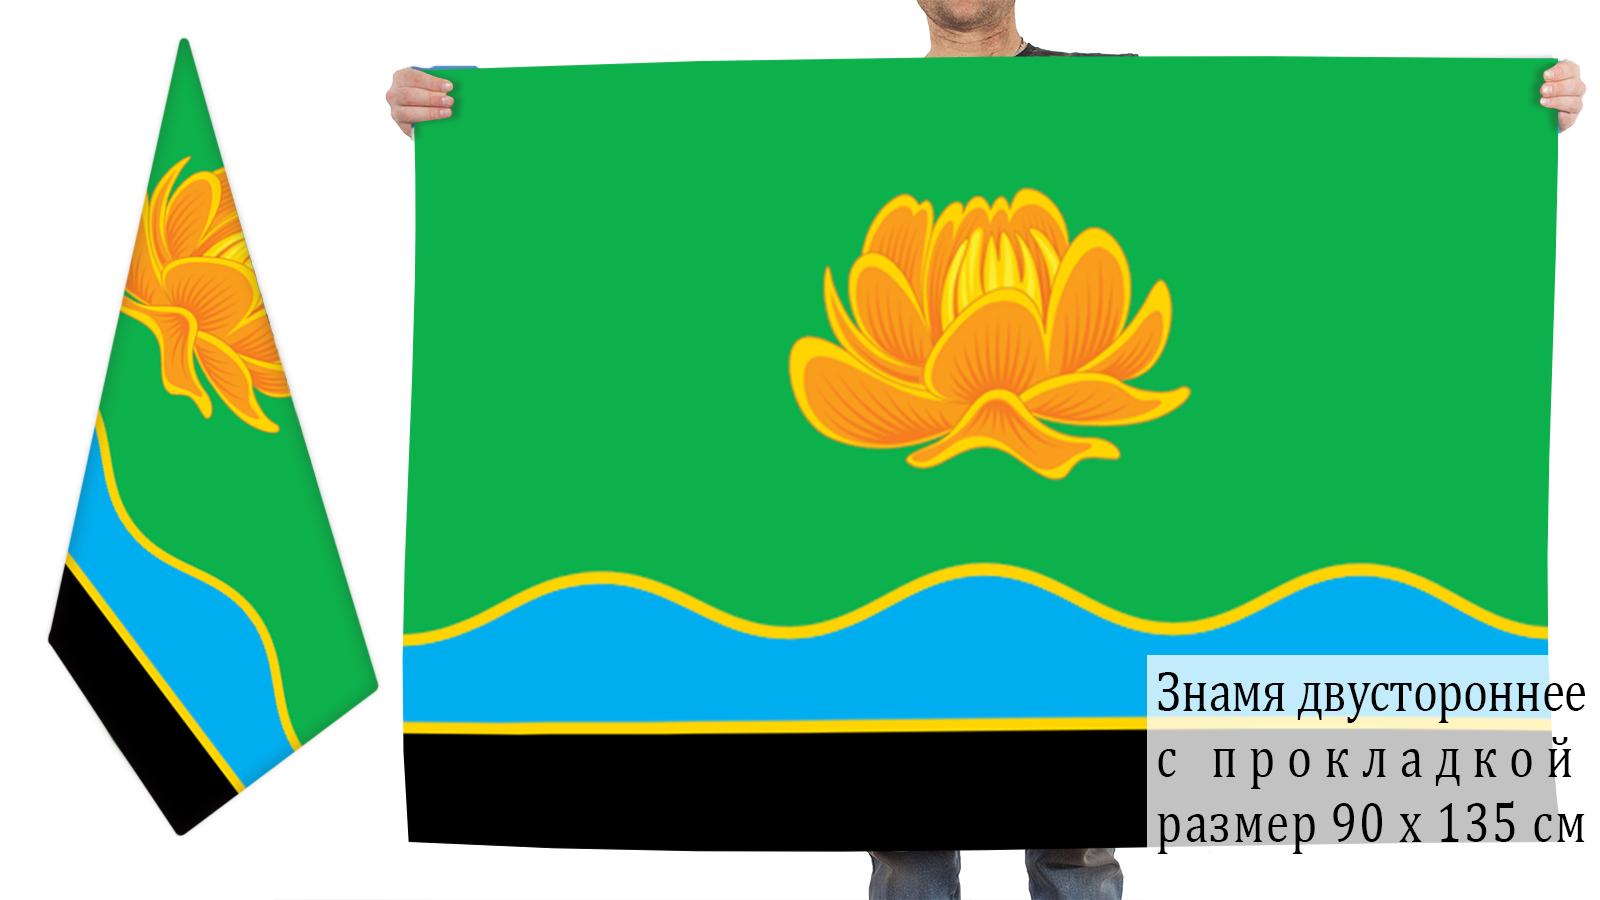 Двусторонний флаг города Мыски